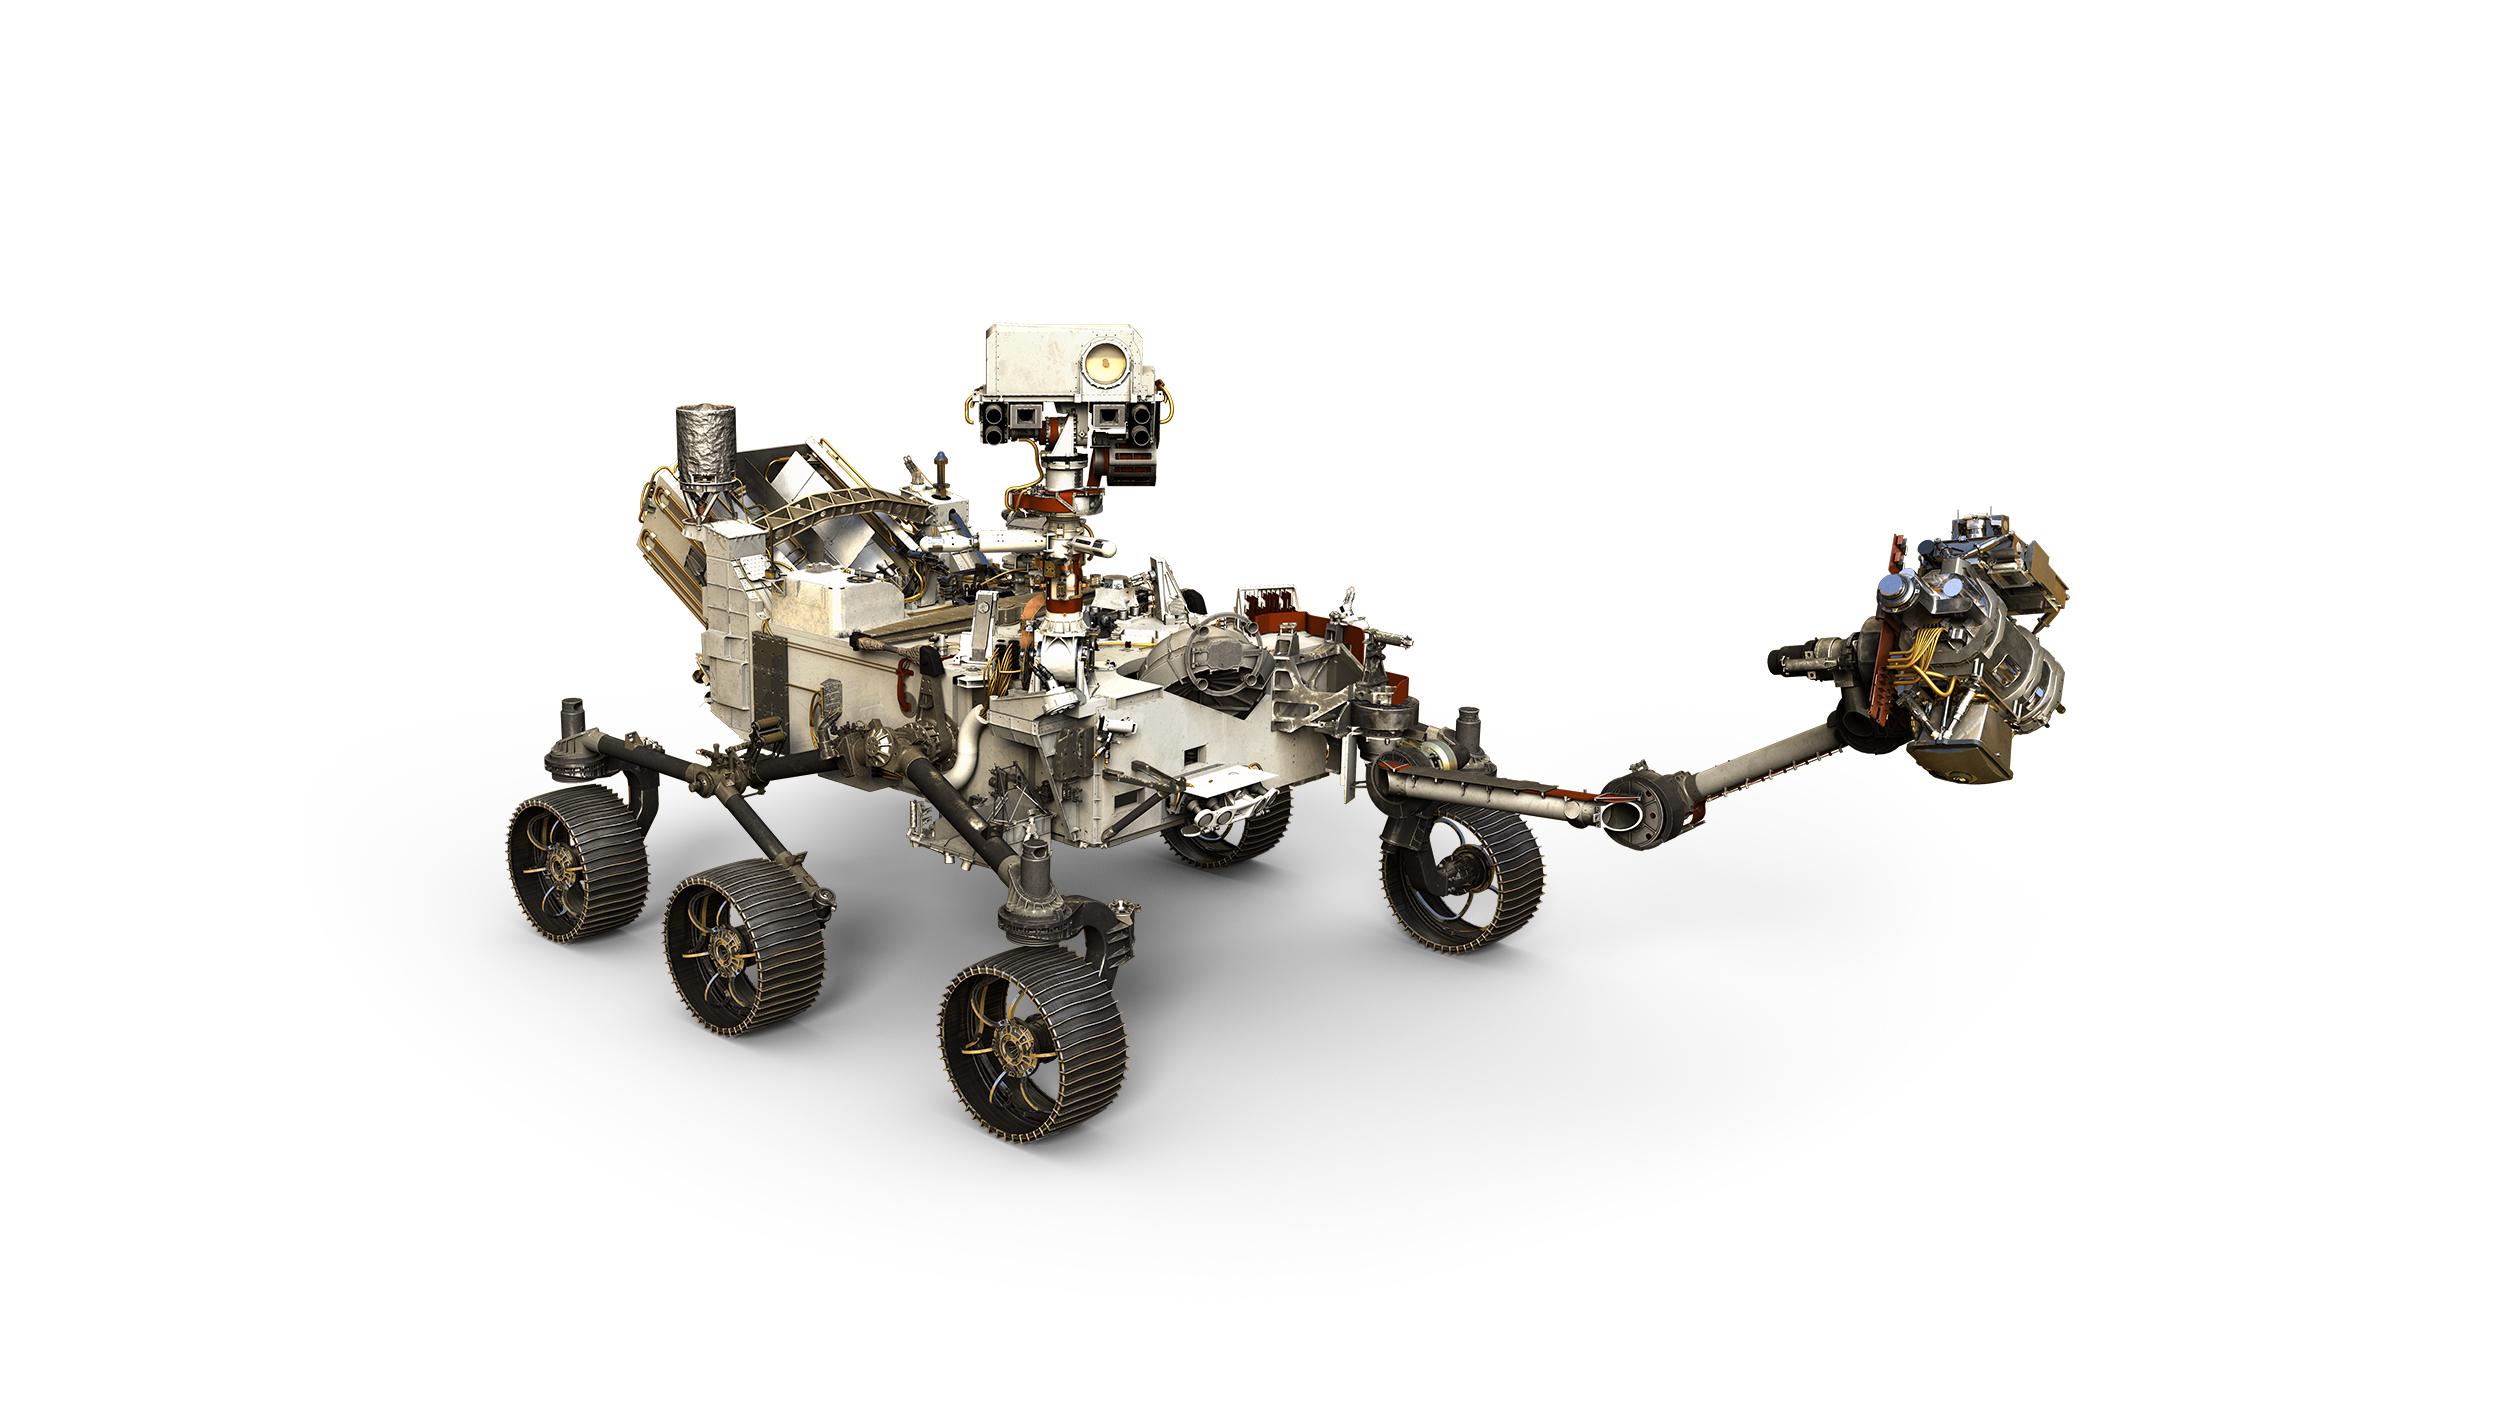 Mars2020 rover 2